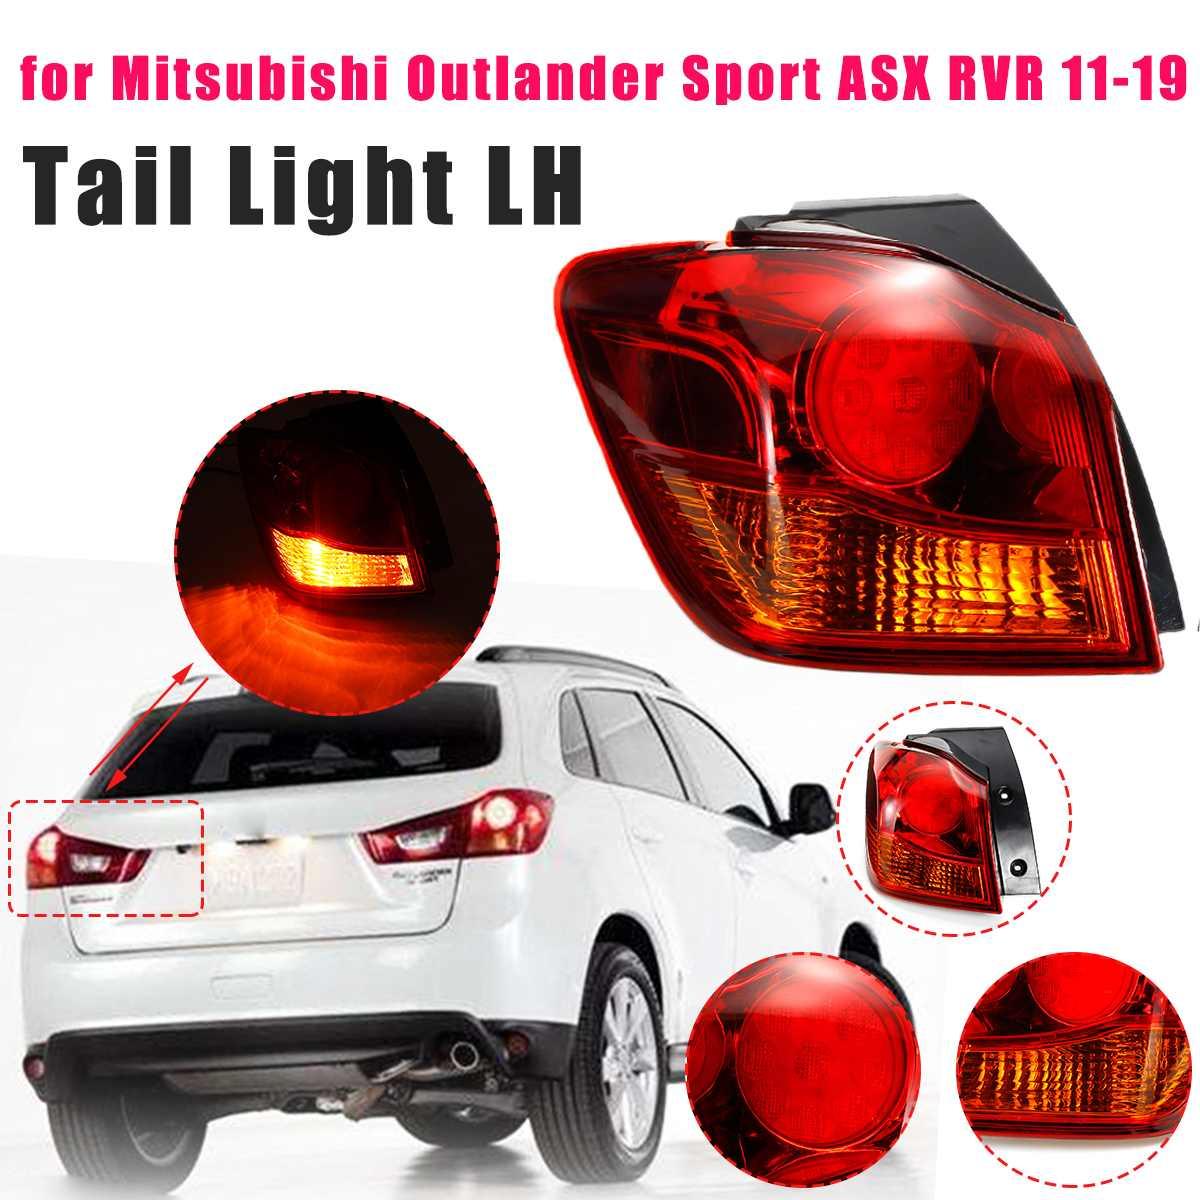 Luz trasera izquierda exterior para Mitsubishi Outlander Sport ASX RVR 2011-2019 lámpara de freno lámpara de señal